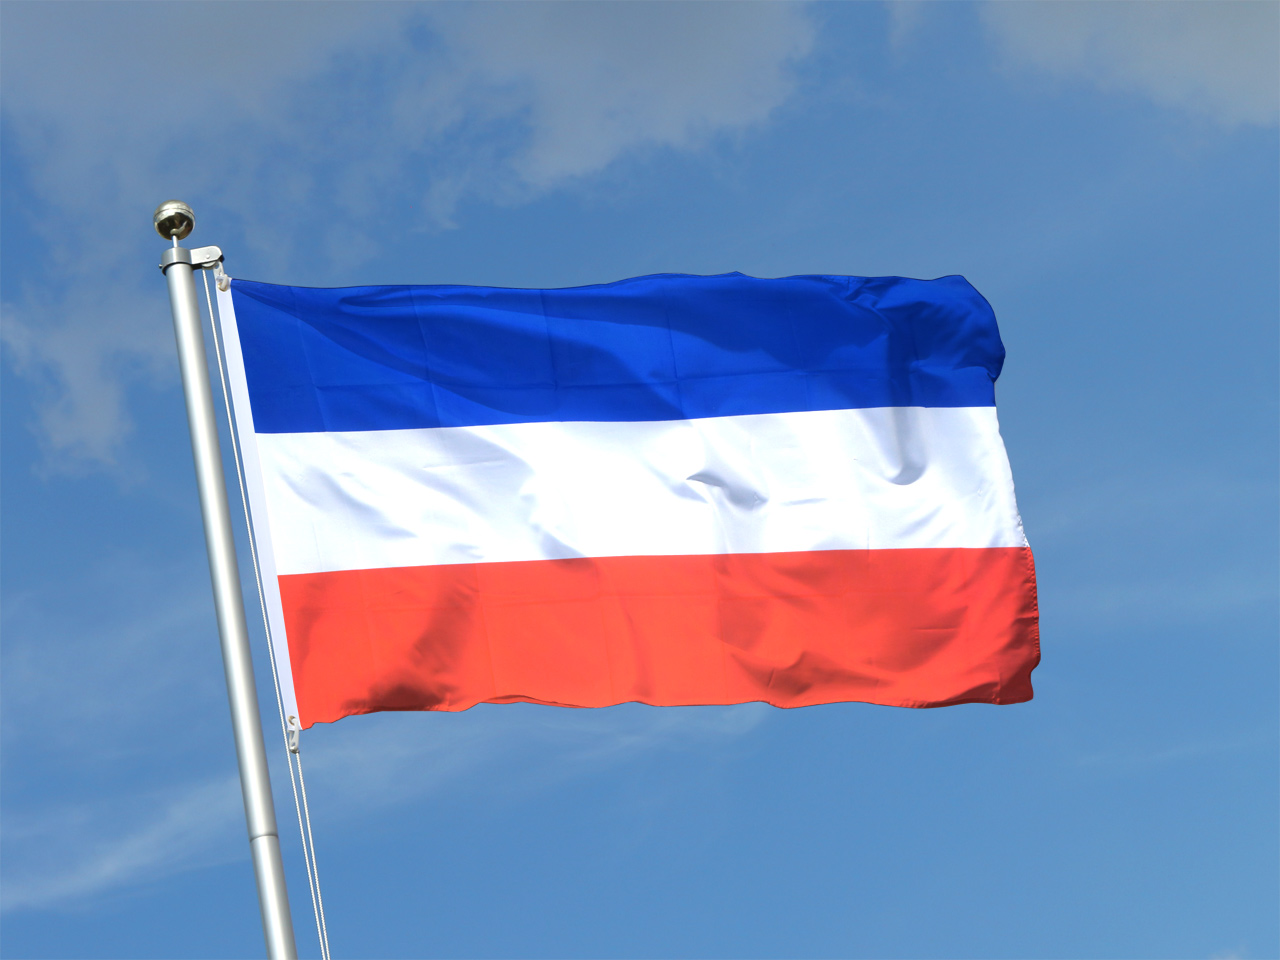 паркетник флаг югославии фото али американский боксёр